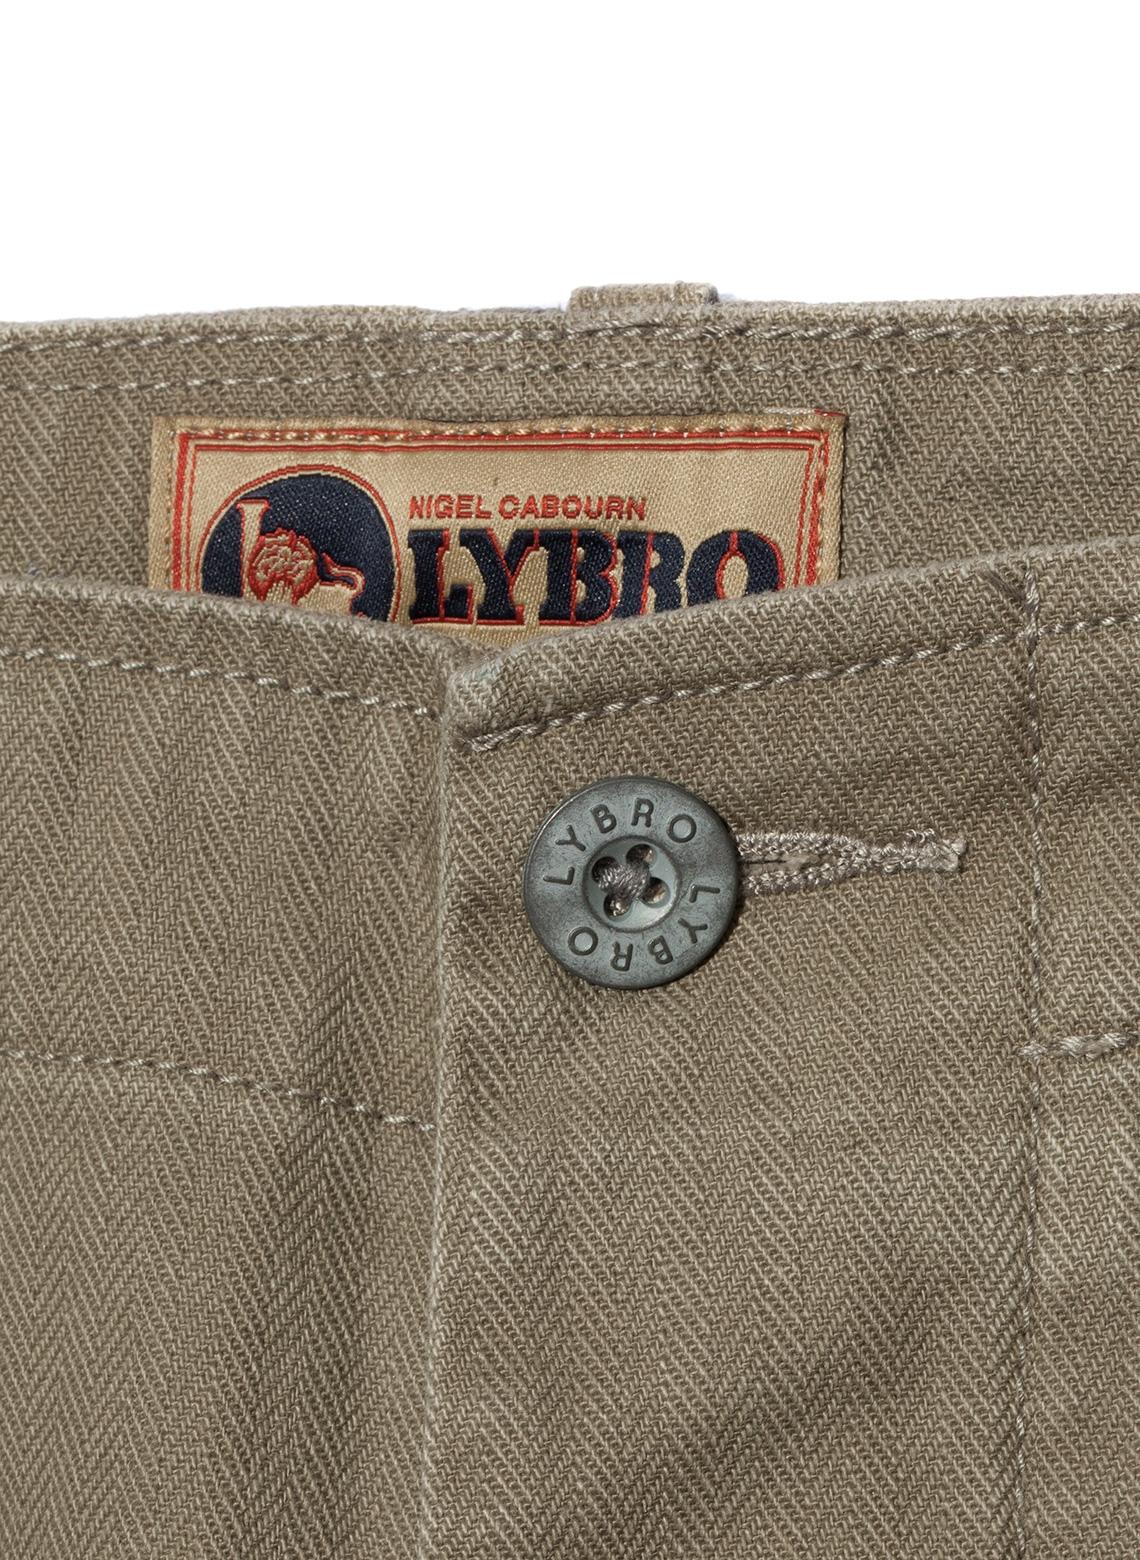 10e2928fcd2c ... Usmc Combat Pant Nigel Cabourn Lybro ...